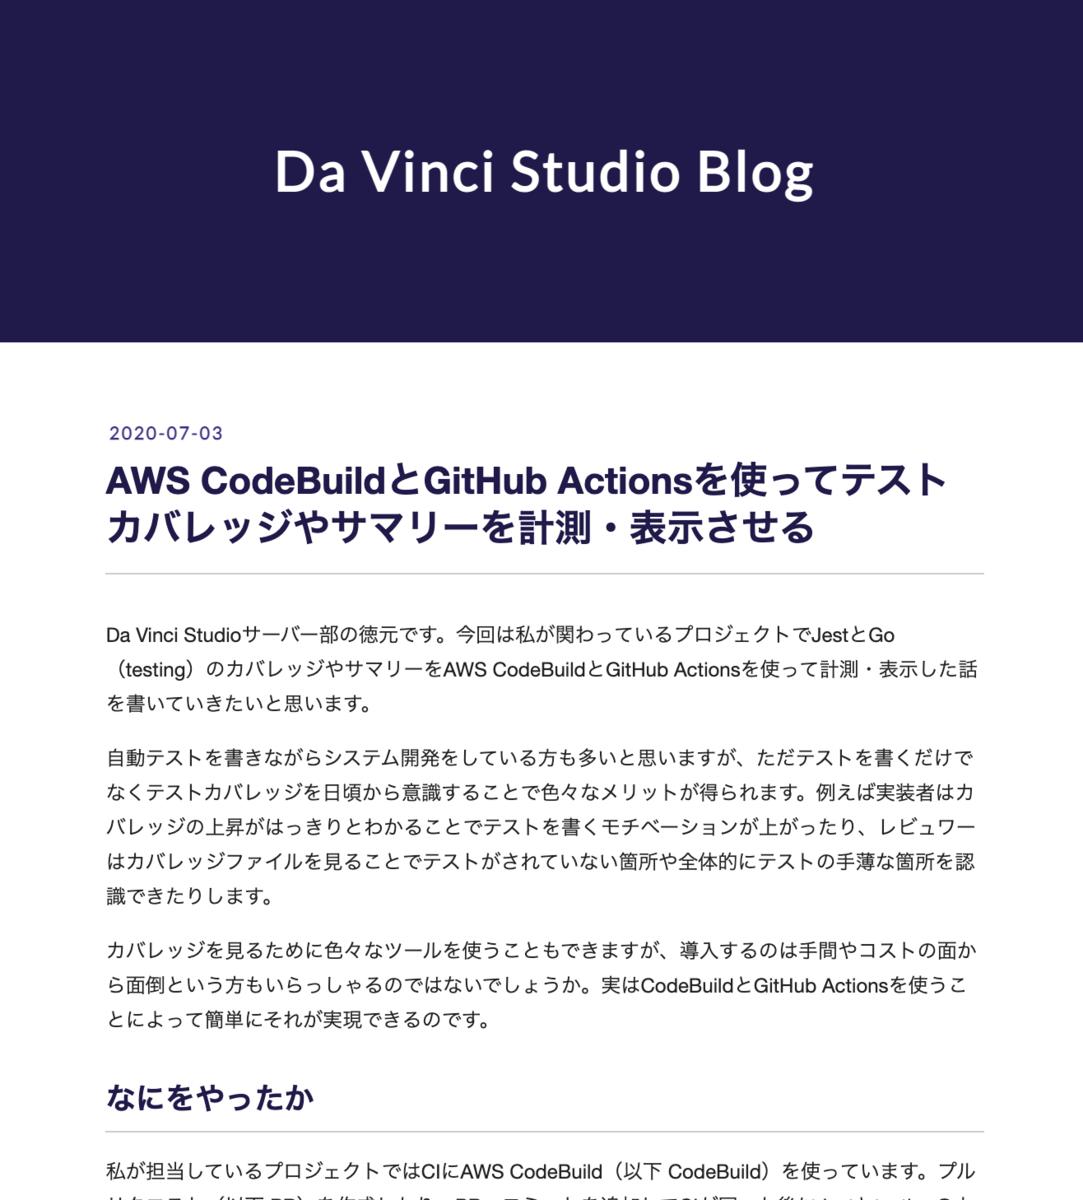 f:id:da-vinci-studio:20210930155201p:plain